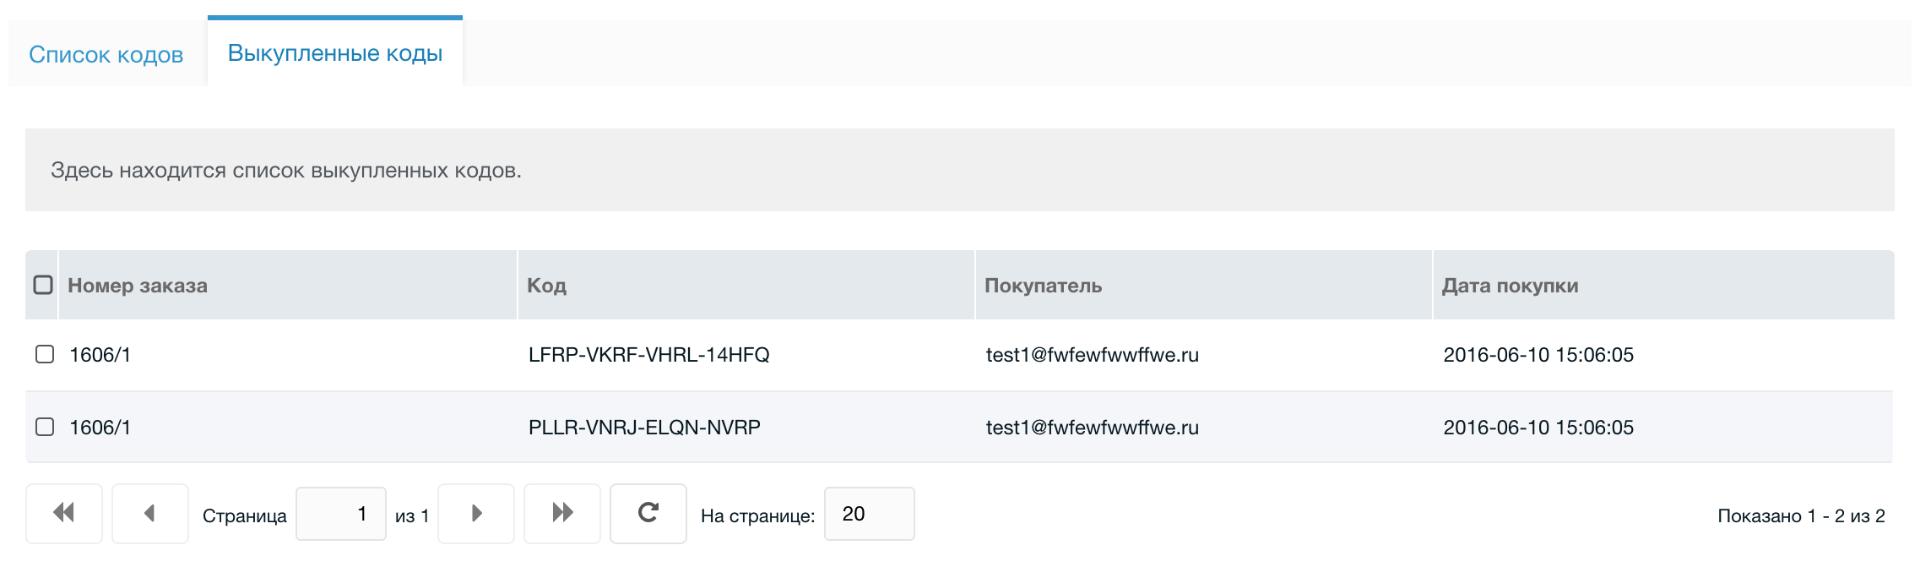 msDigitalOffers / Корзина, Заказы / Все дополнения / modstore.pro